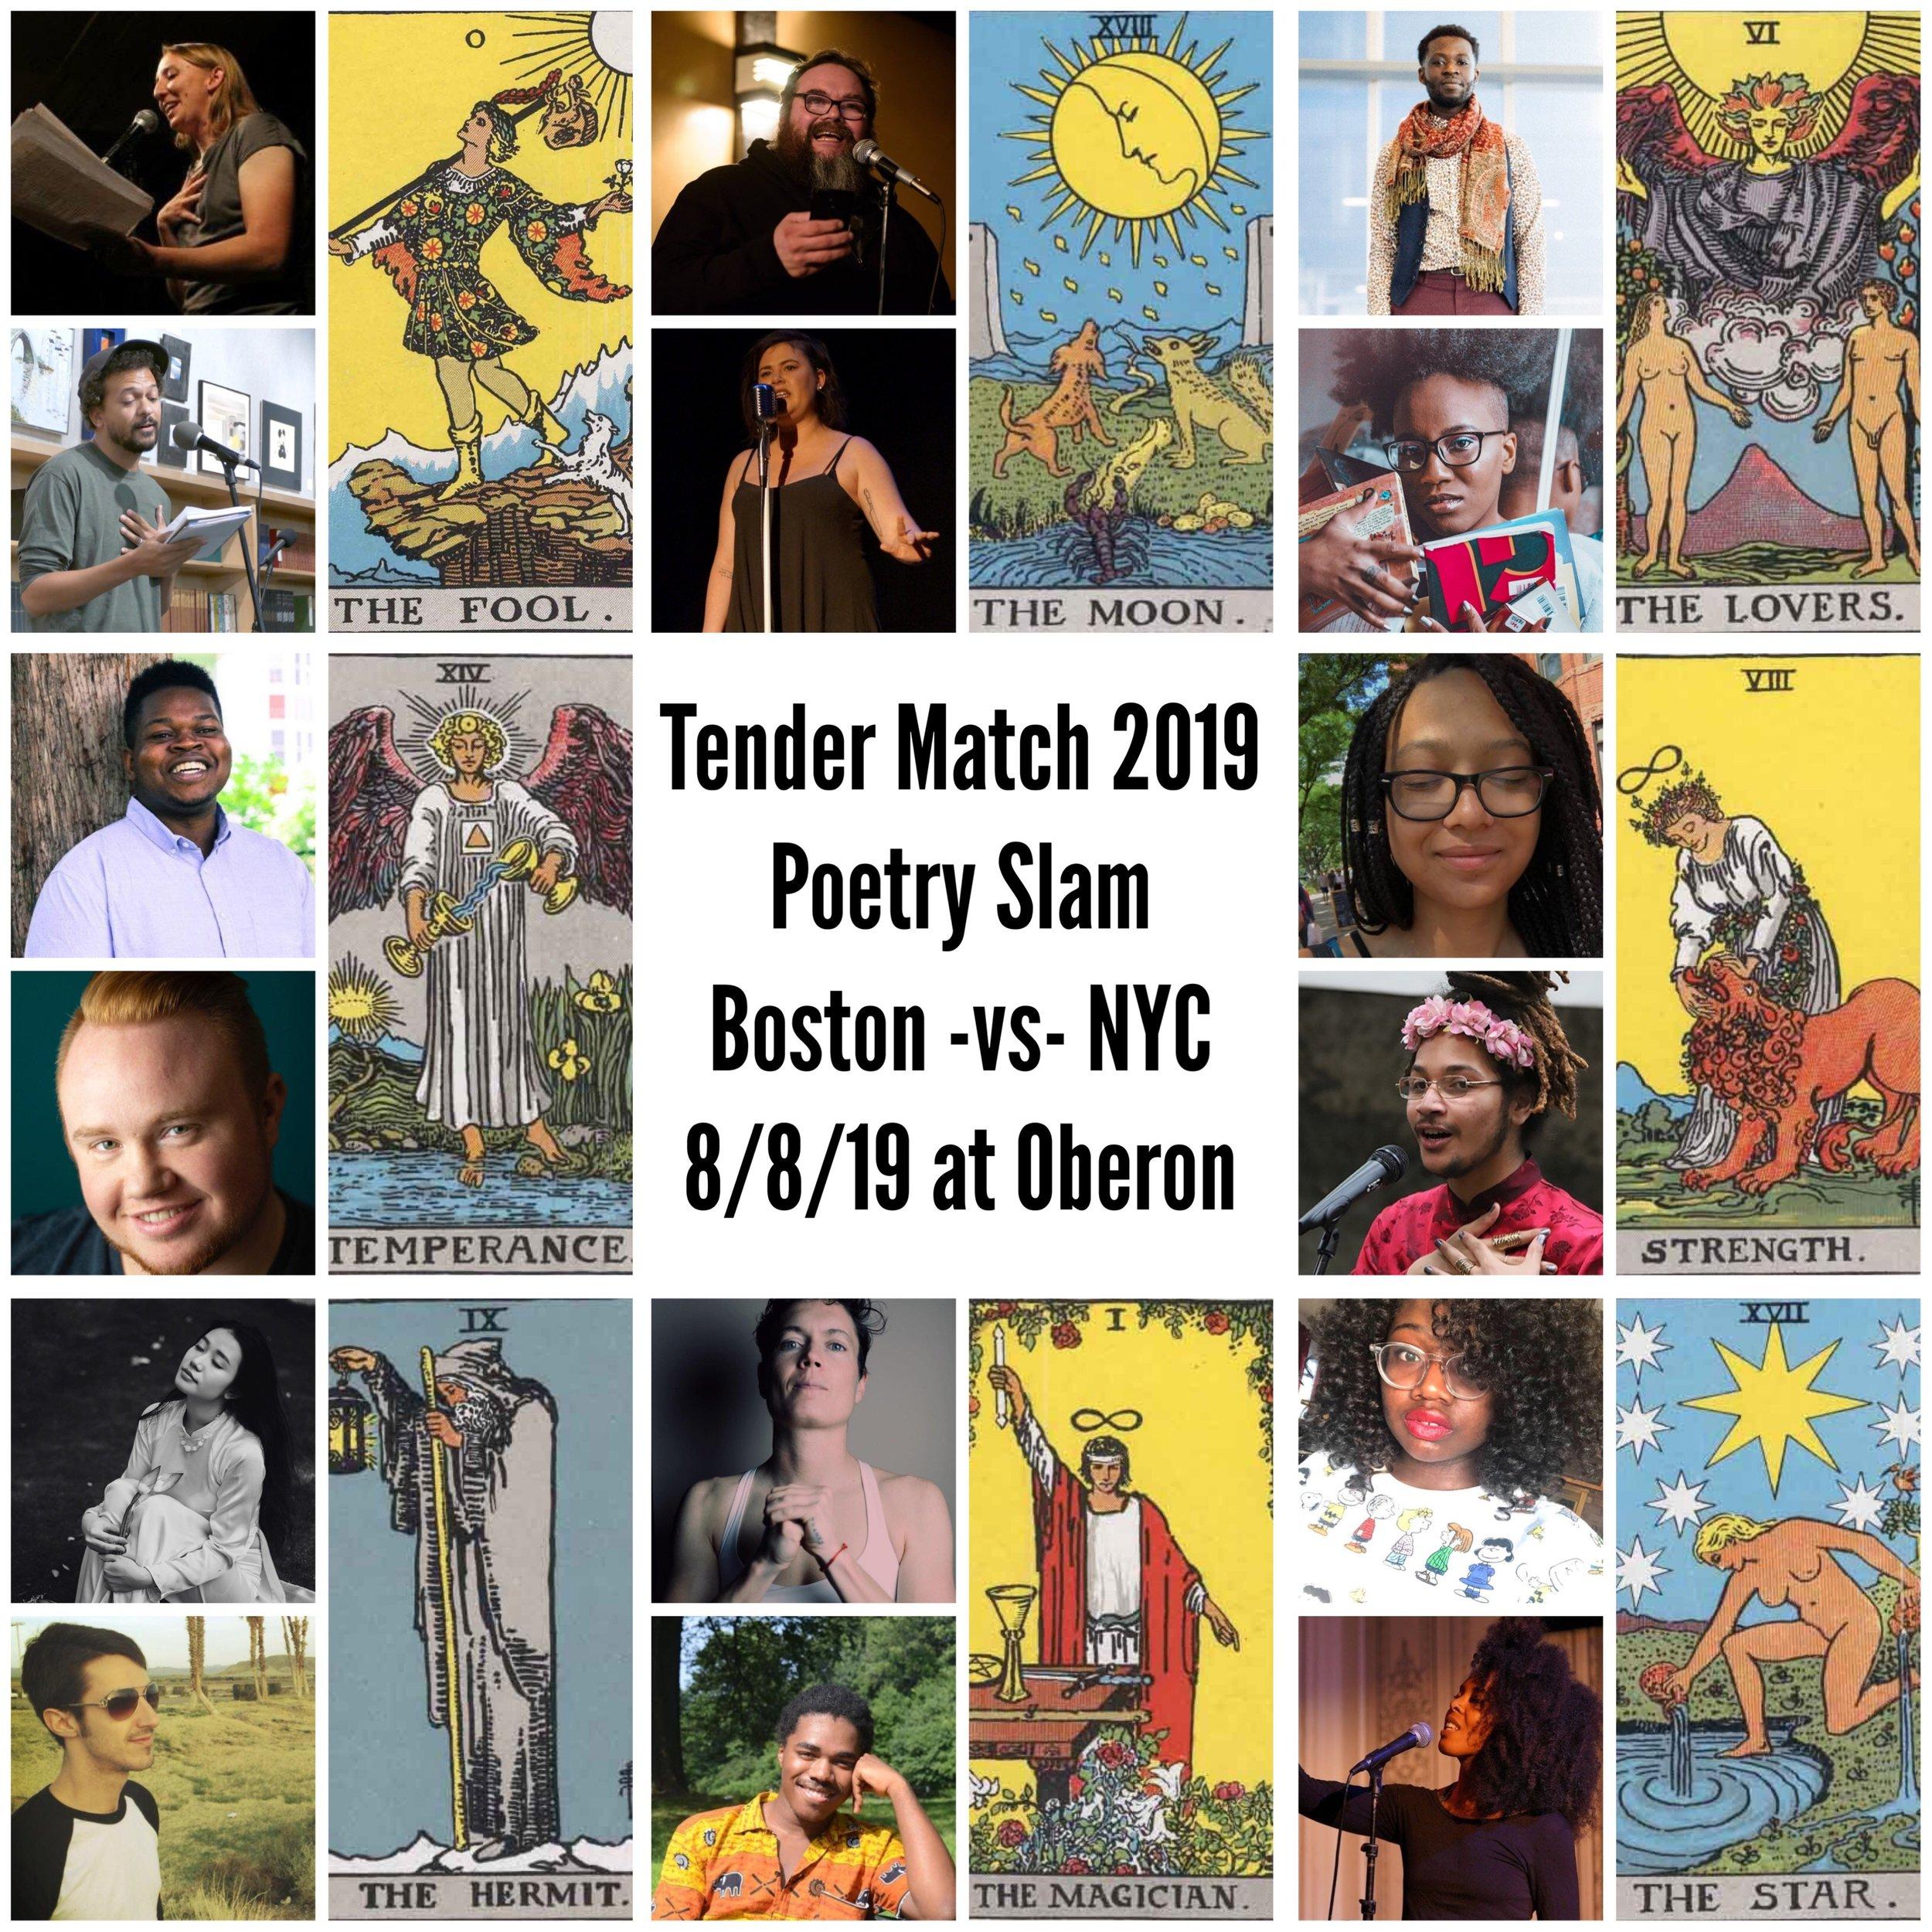 Head-to-Head Poetry Slam. Writing prompts all based on Major Arcana Tarot Cards